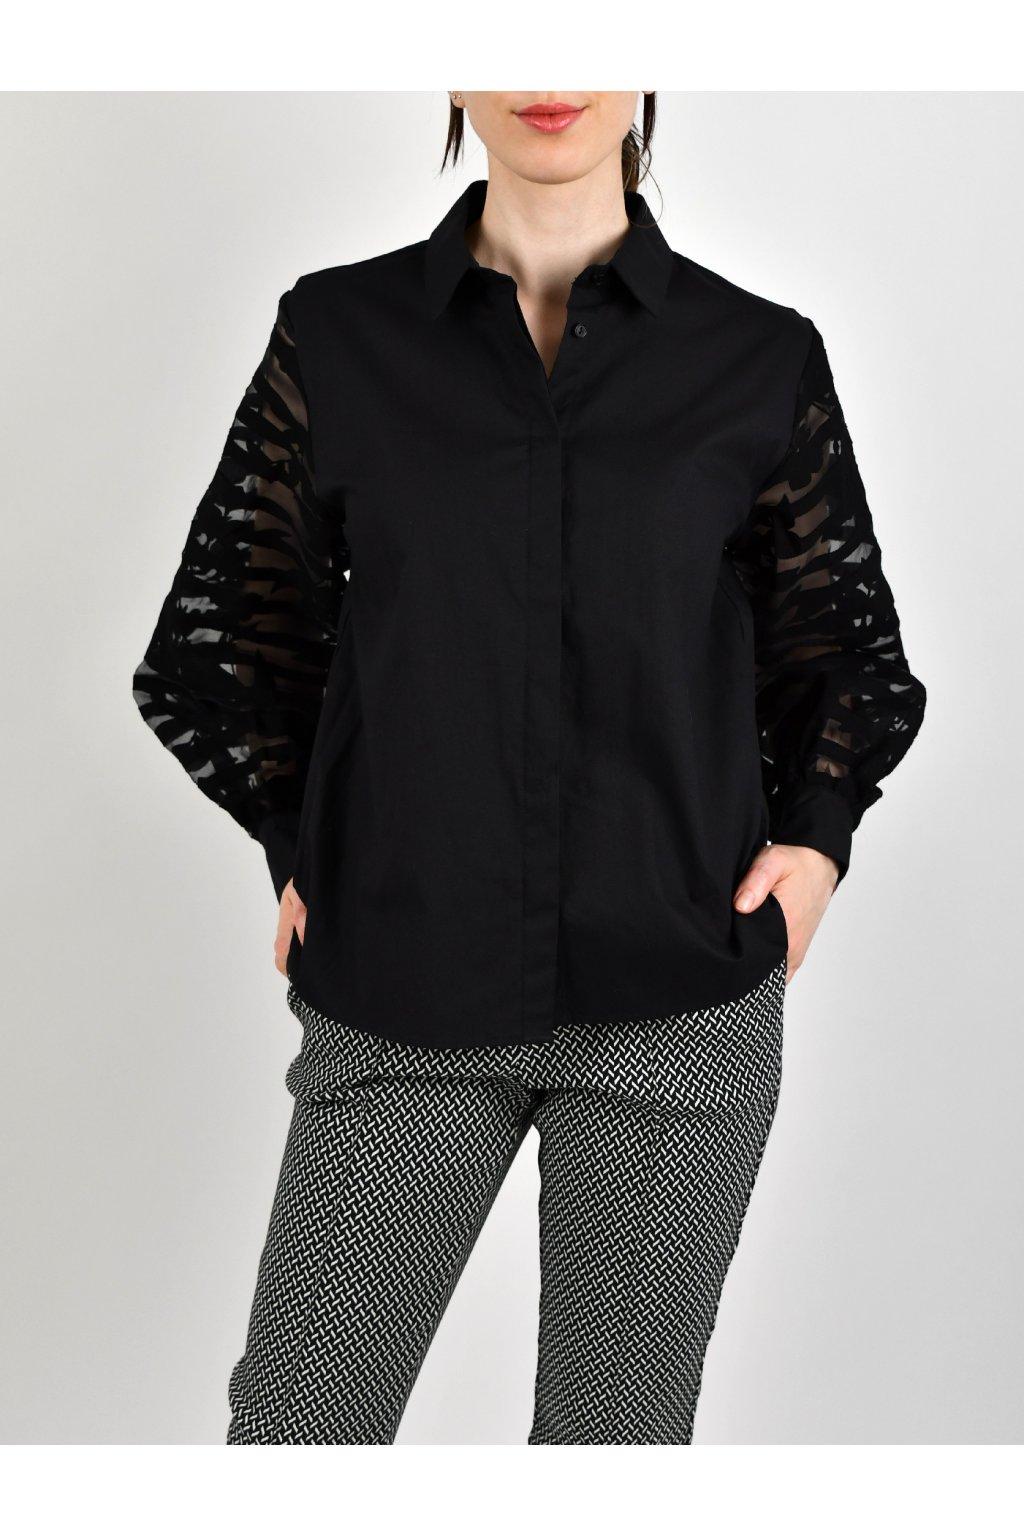 bluzka-bavlnena-cierna-black-sl